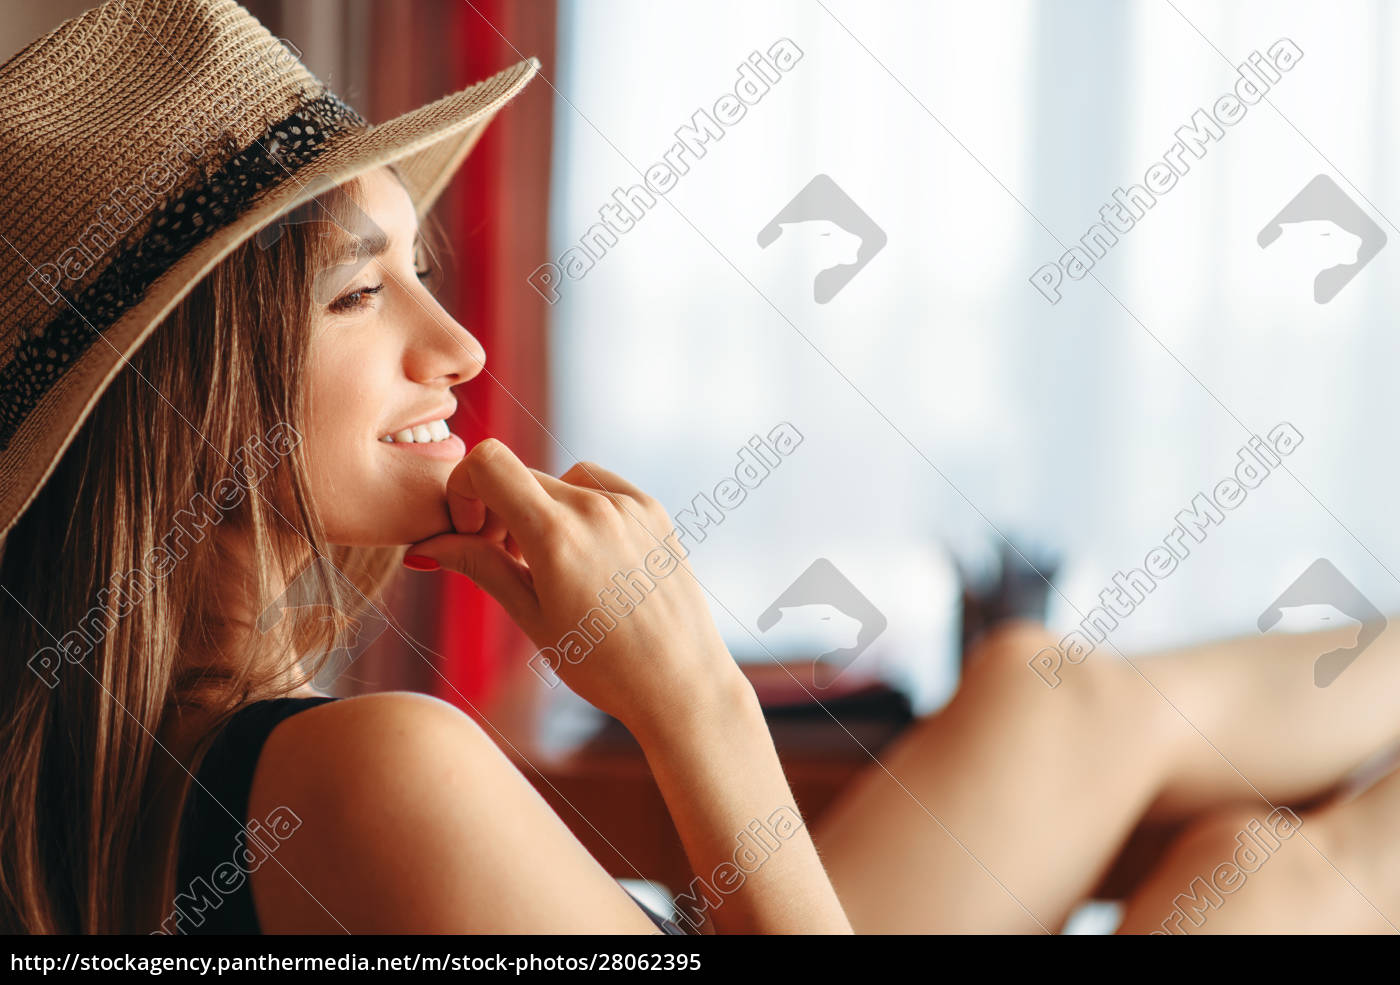 woman, threw, legs, on, table, , dream - 28062395